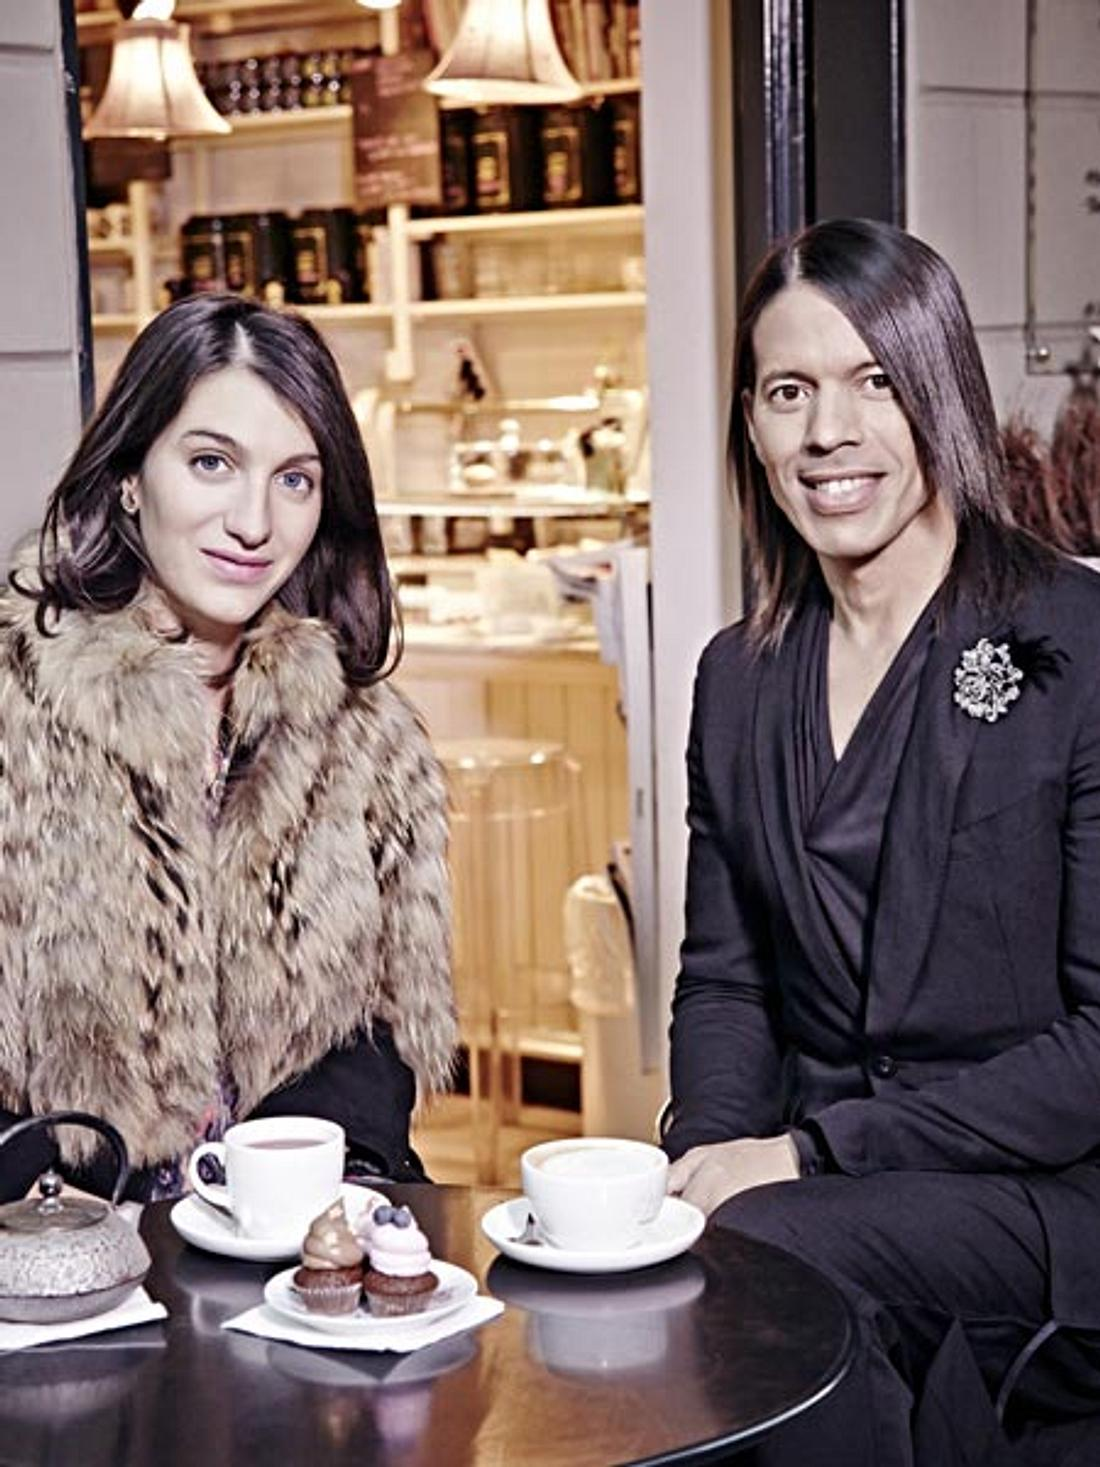 Jorge Gonzalez trifft Marta Ferri in Mailand